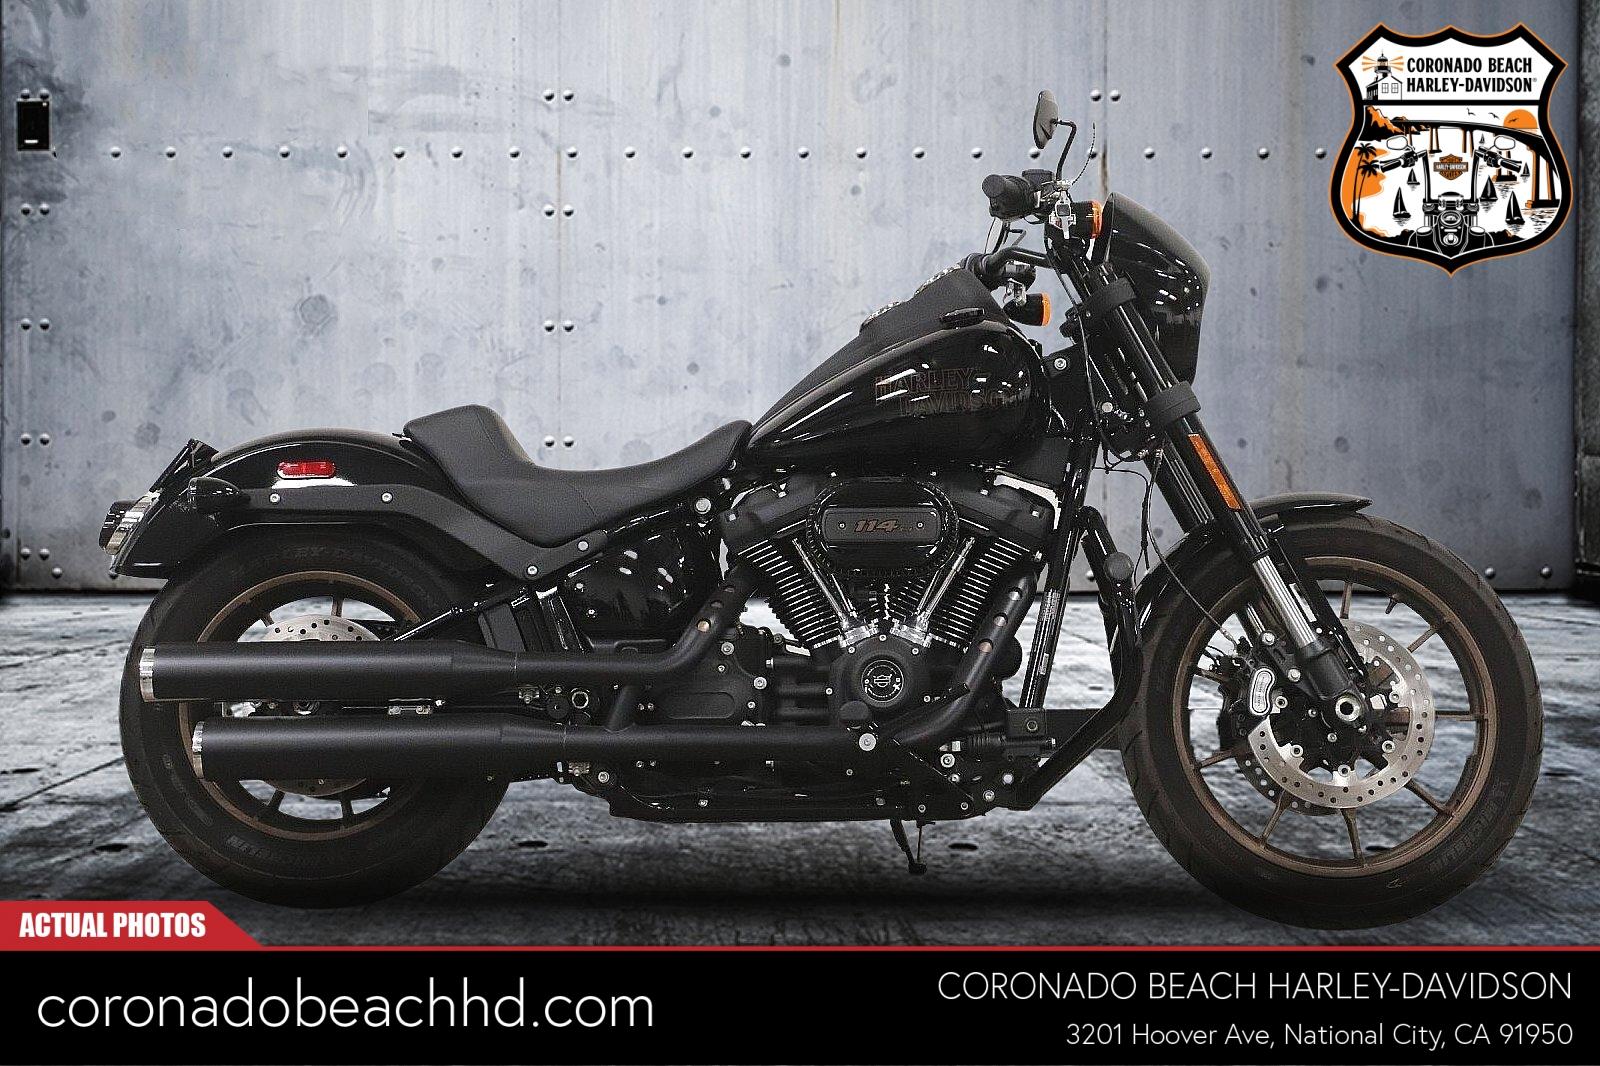 2020 Harley-Davidson Lowrider S [39]